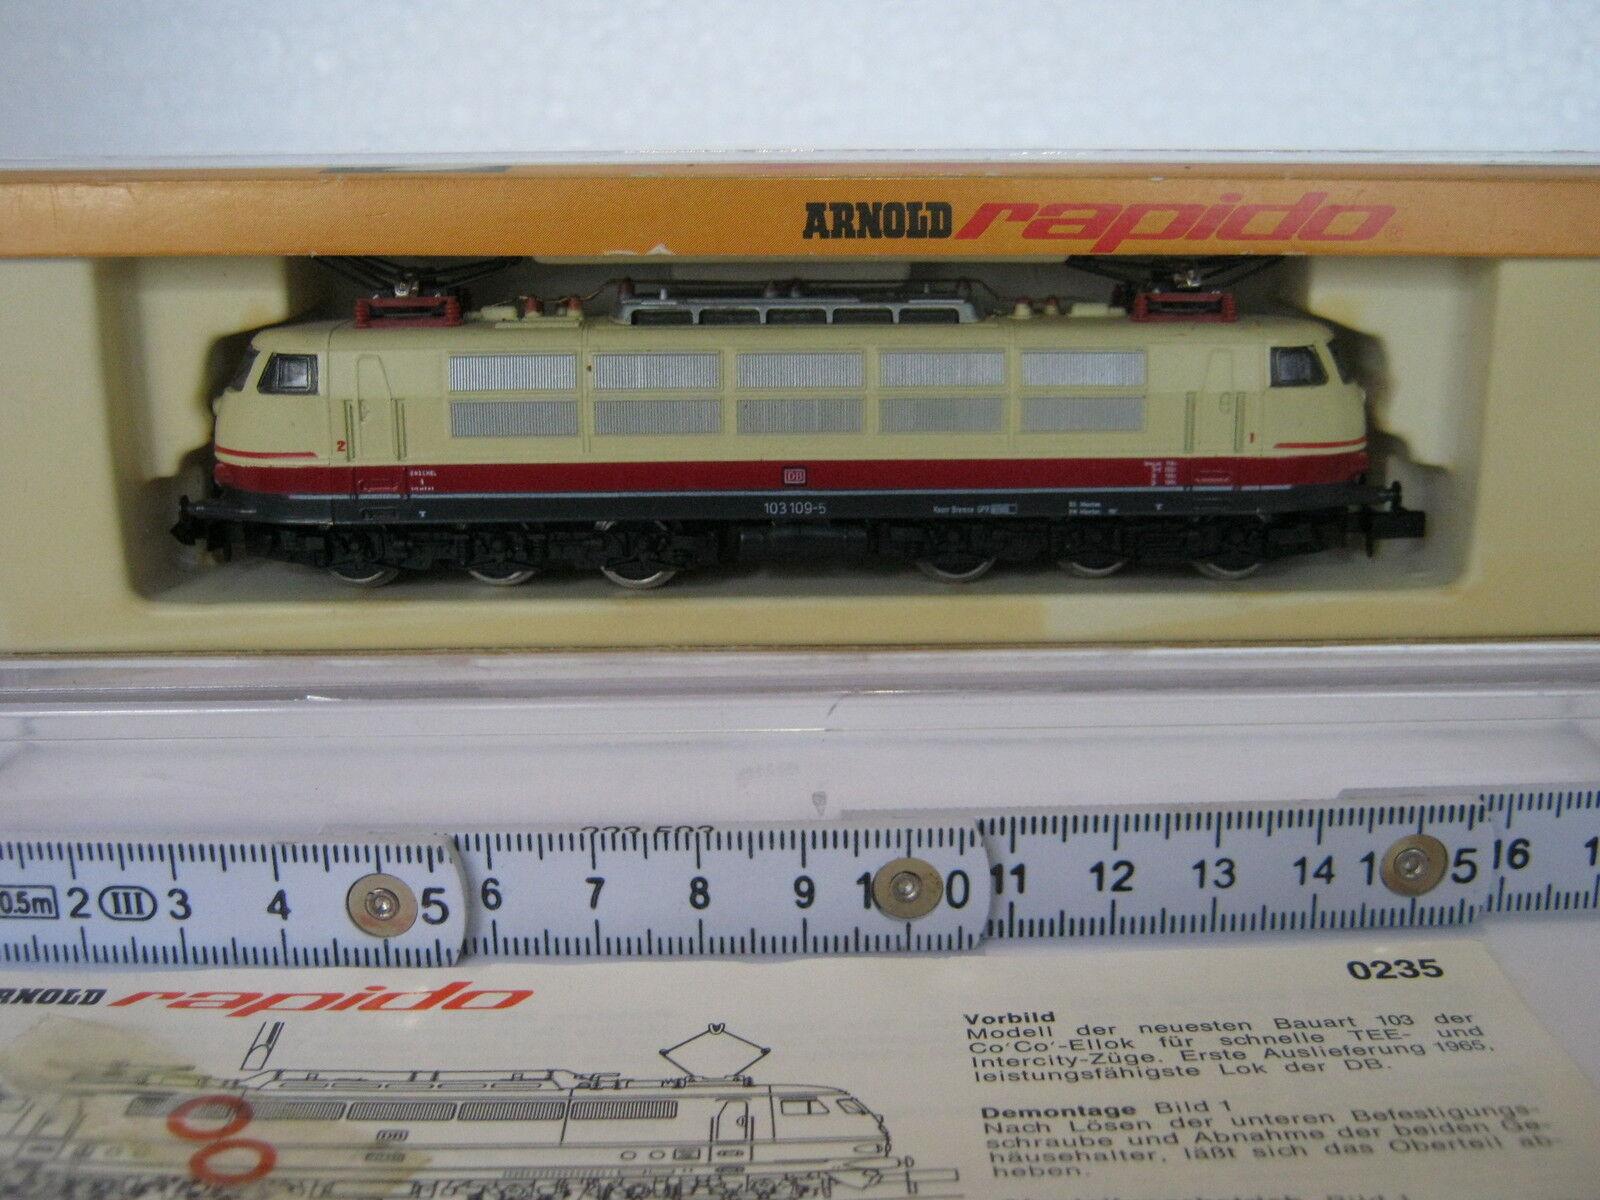 Arnold N 2350 E - Lok BR 103 109-5 DB (RG RR 059-45S5 3)